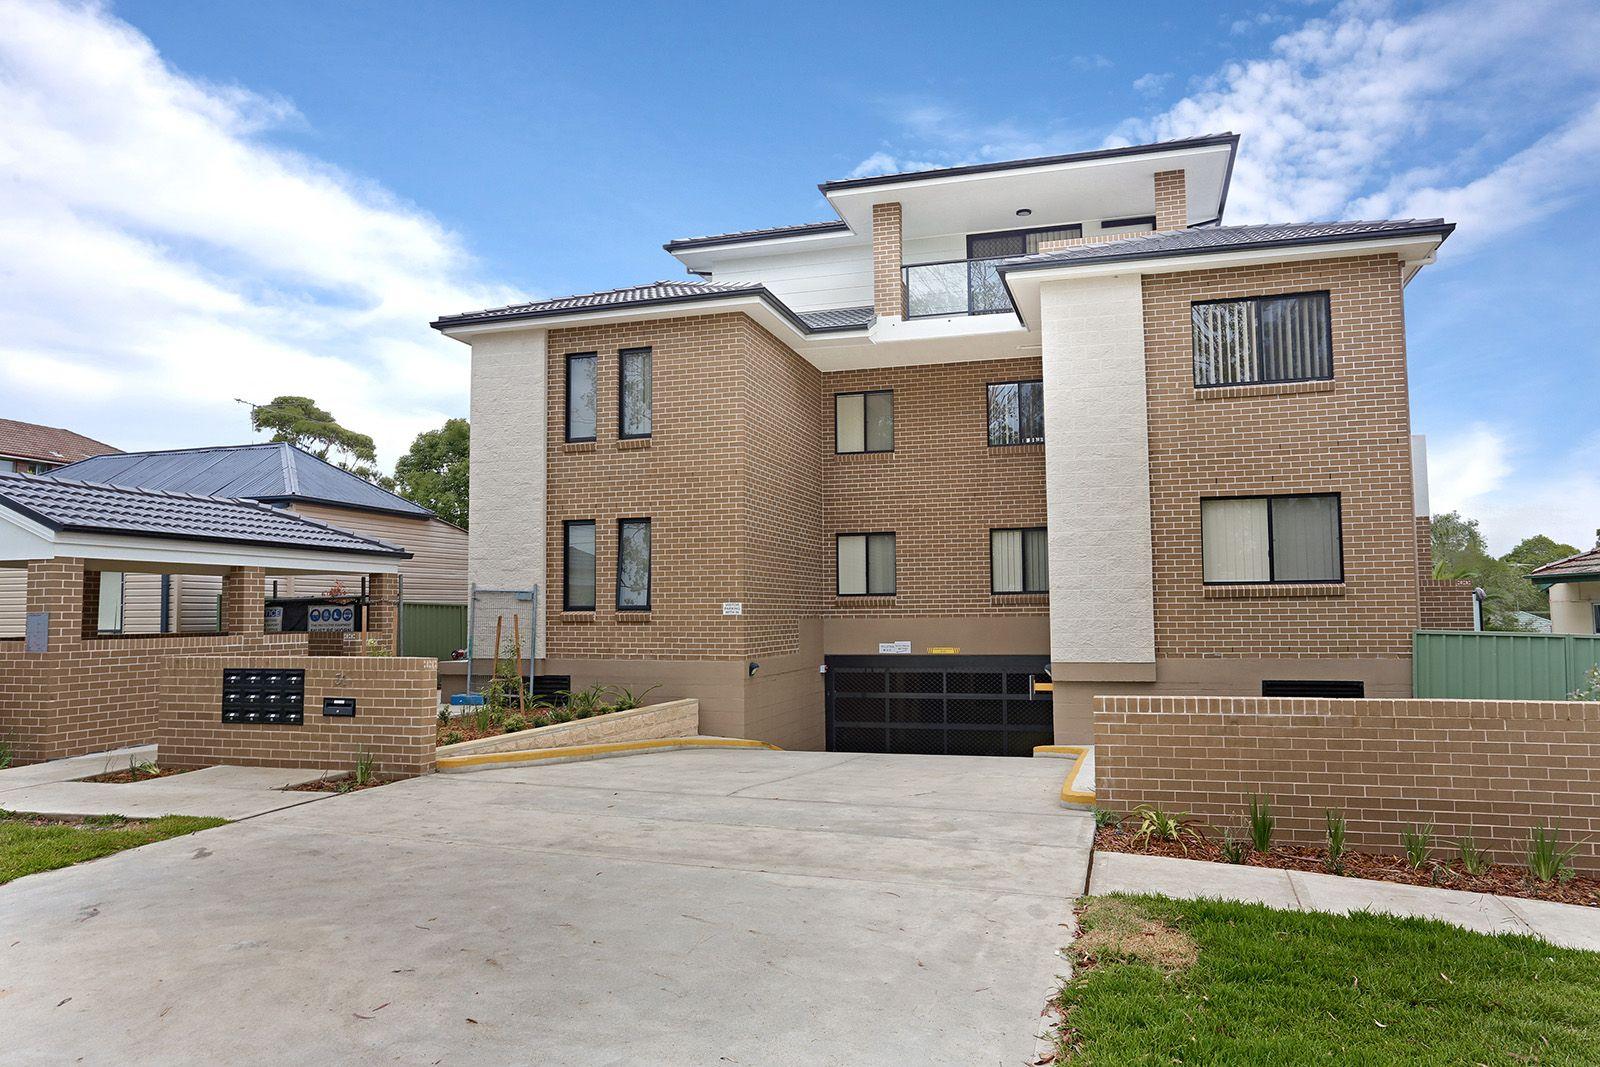 10/31 King Street, Penrith NSW 2750, Image 0